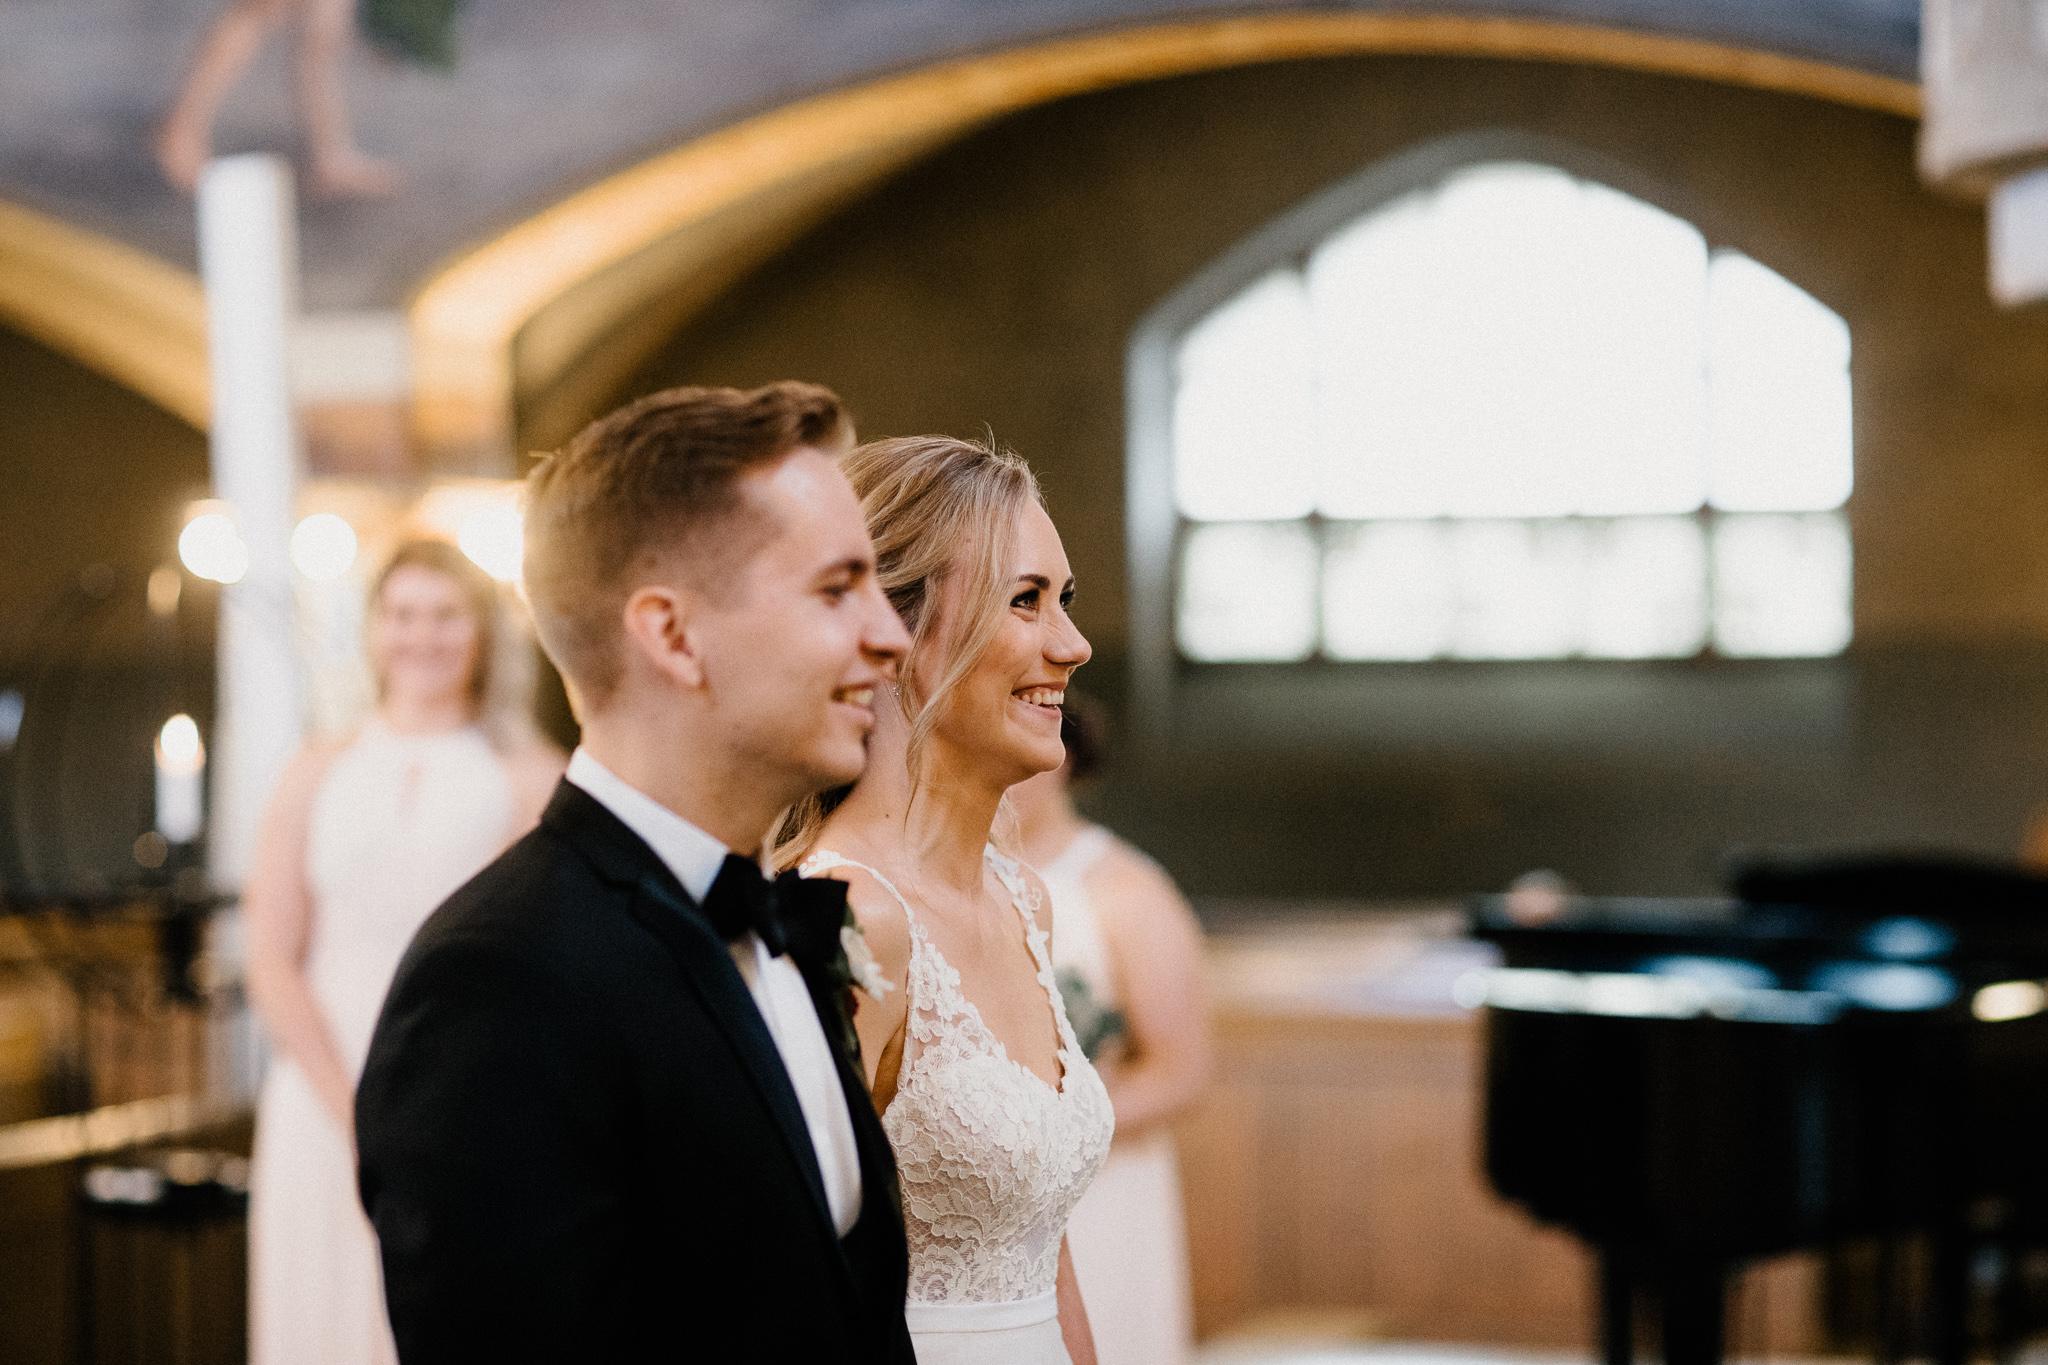 Johanna + Mikko - Tampere - Photo by Patrick Karkkolainen Wedding Photographer-66.jpg